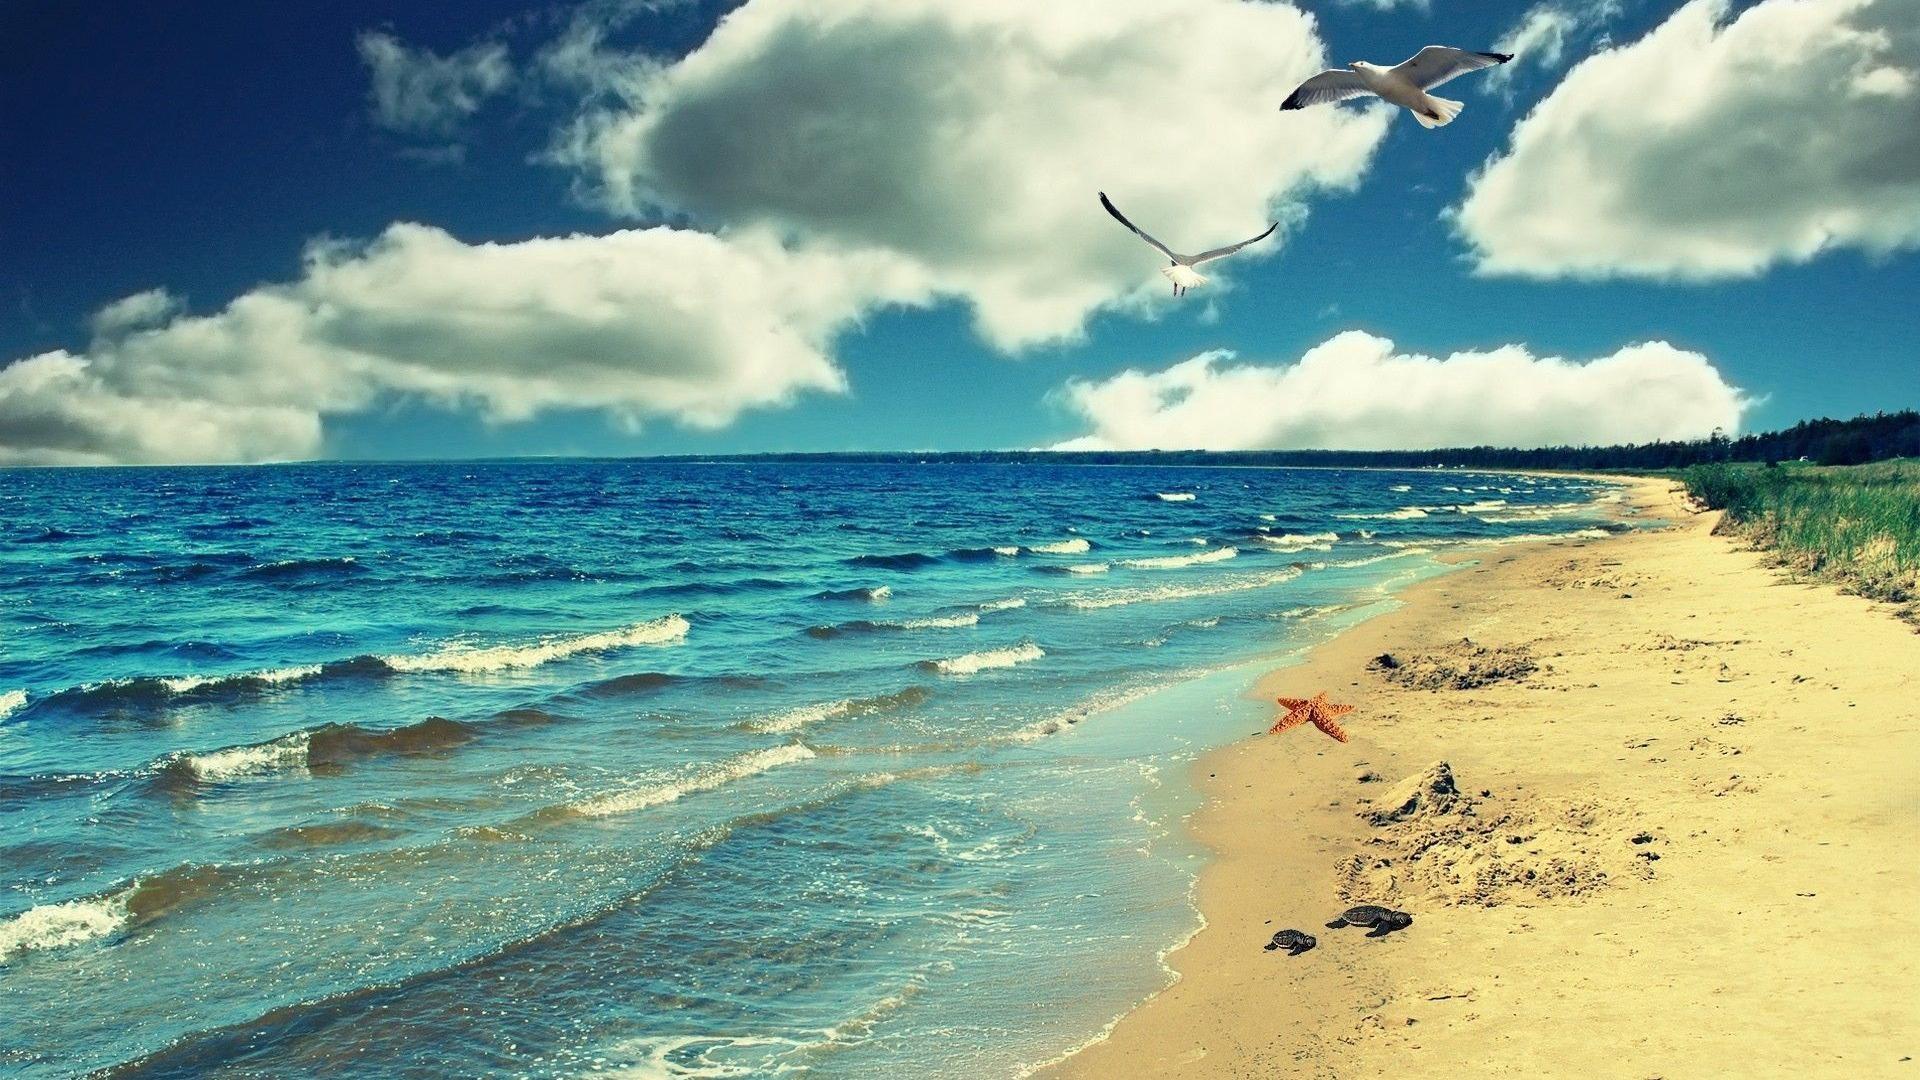 Sea nature side wallpaper 1080P.